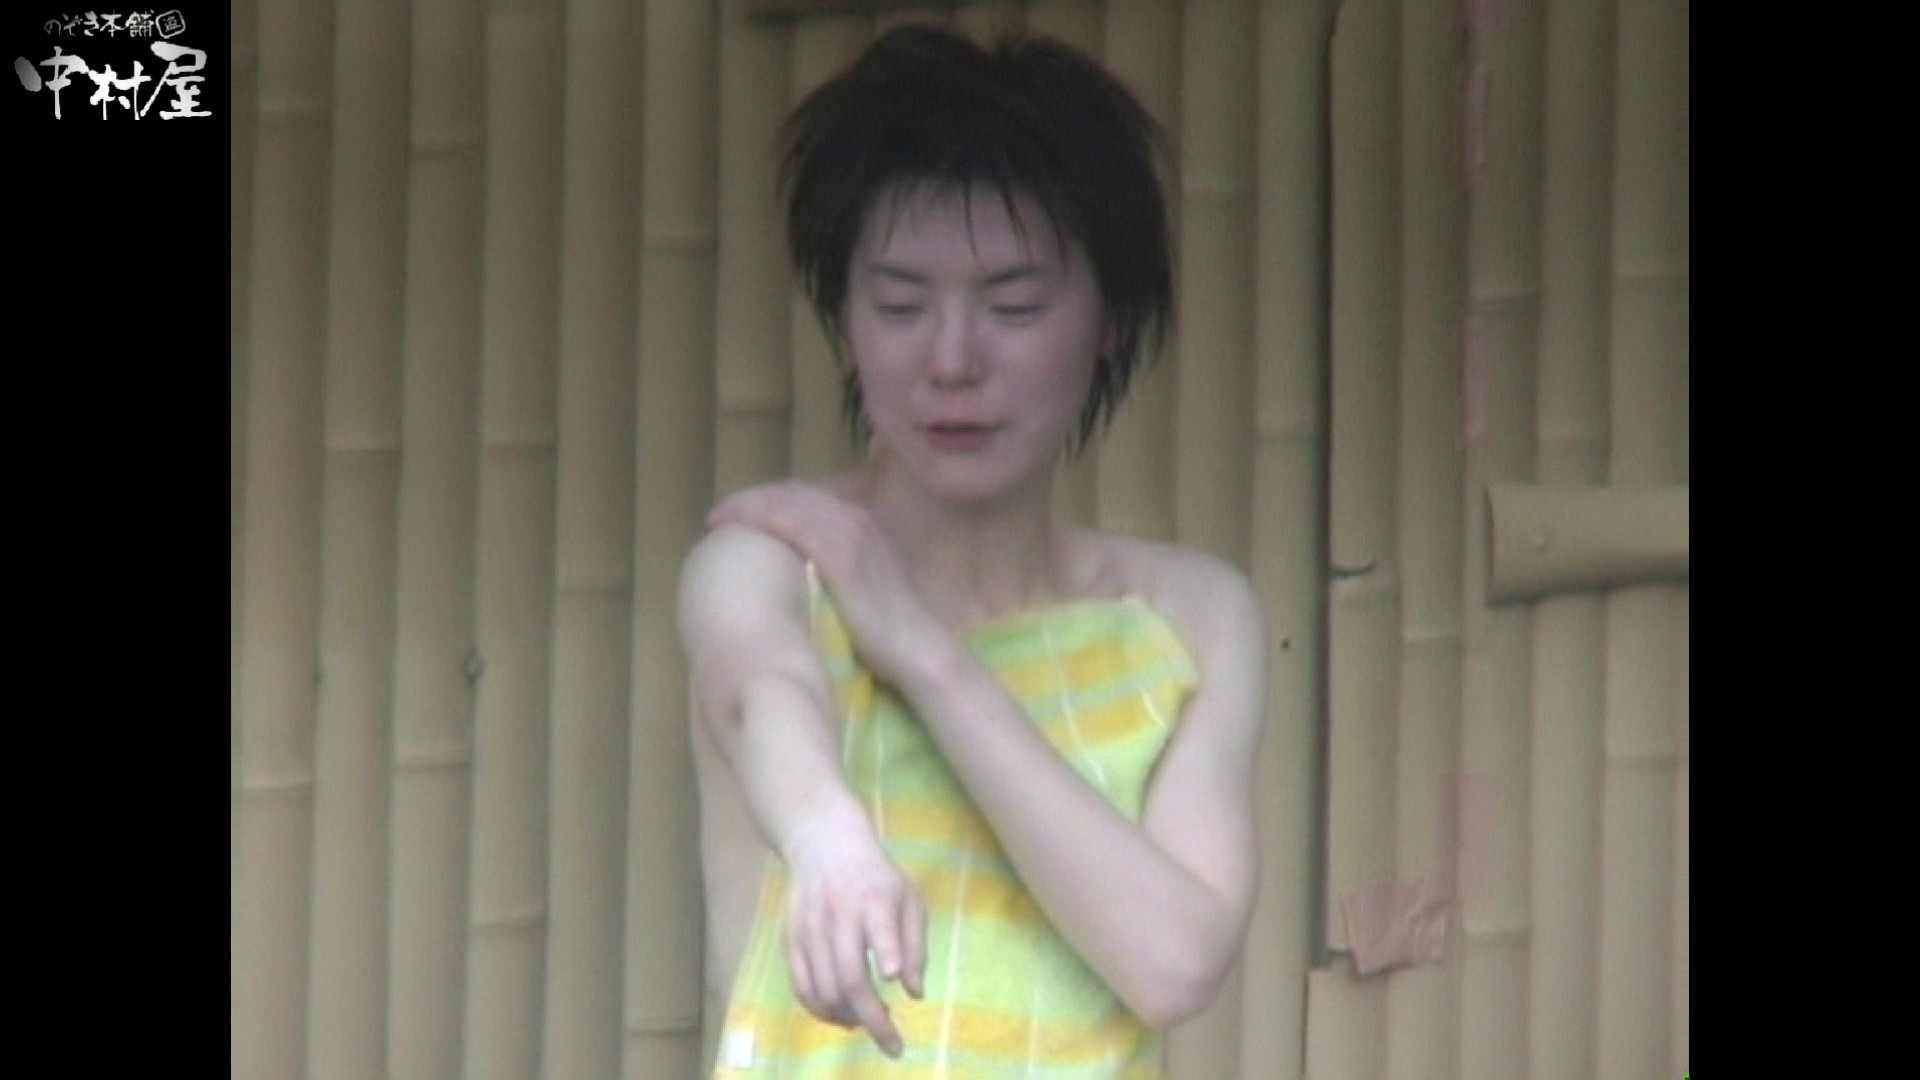 Aquaな露天風呂Vol.938 OLセックス | 盗撮  57画像 55